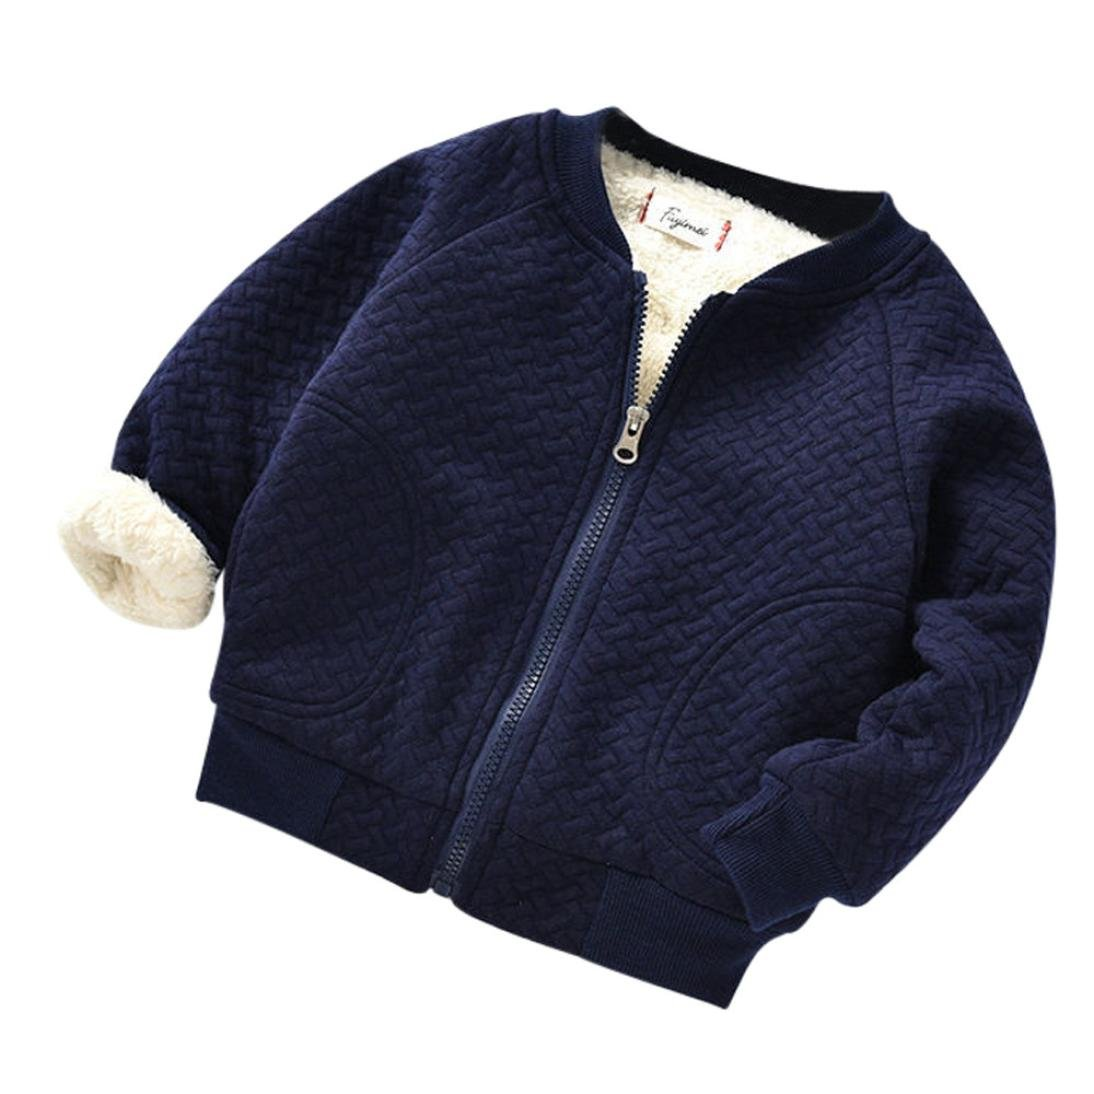 Amlaiworld Baby M/ädchen pullis Jungen Langarm Pl/üsch M/äntel Kinder Mode Tops flauschig warm Winter Shirt Pullover Jacke,0-24Monate